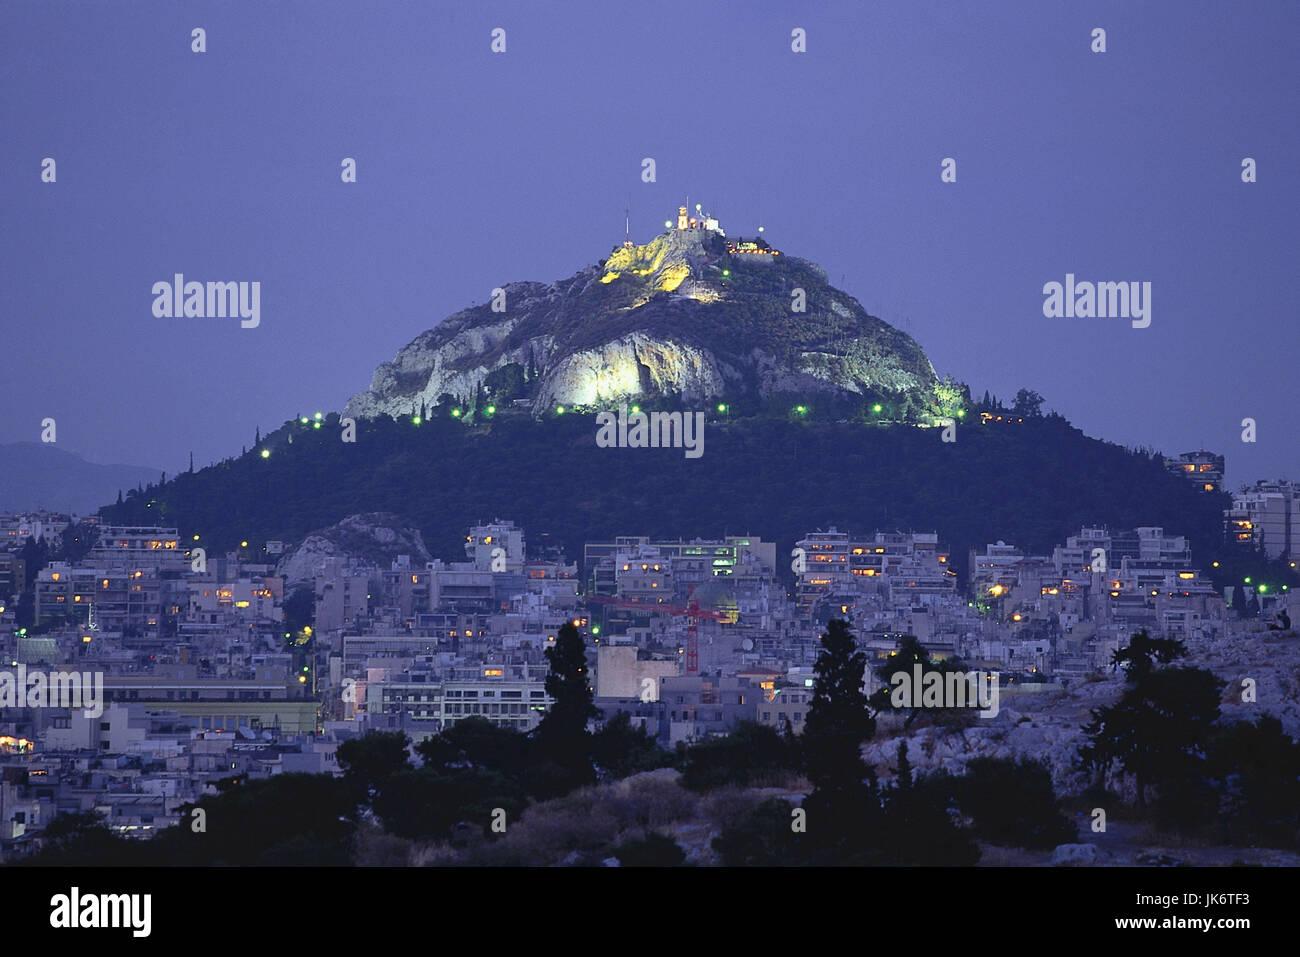 Griechenland, Region Attika, Athen,  Stadtübersicht, Altstadt 'Plaka', Kalksteinfels 'Lykavittos', - Stock Image